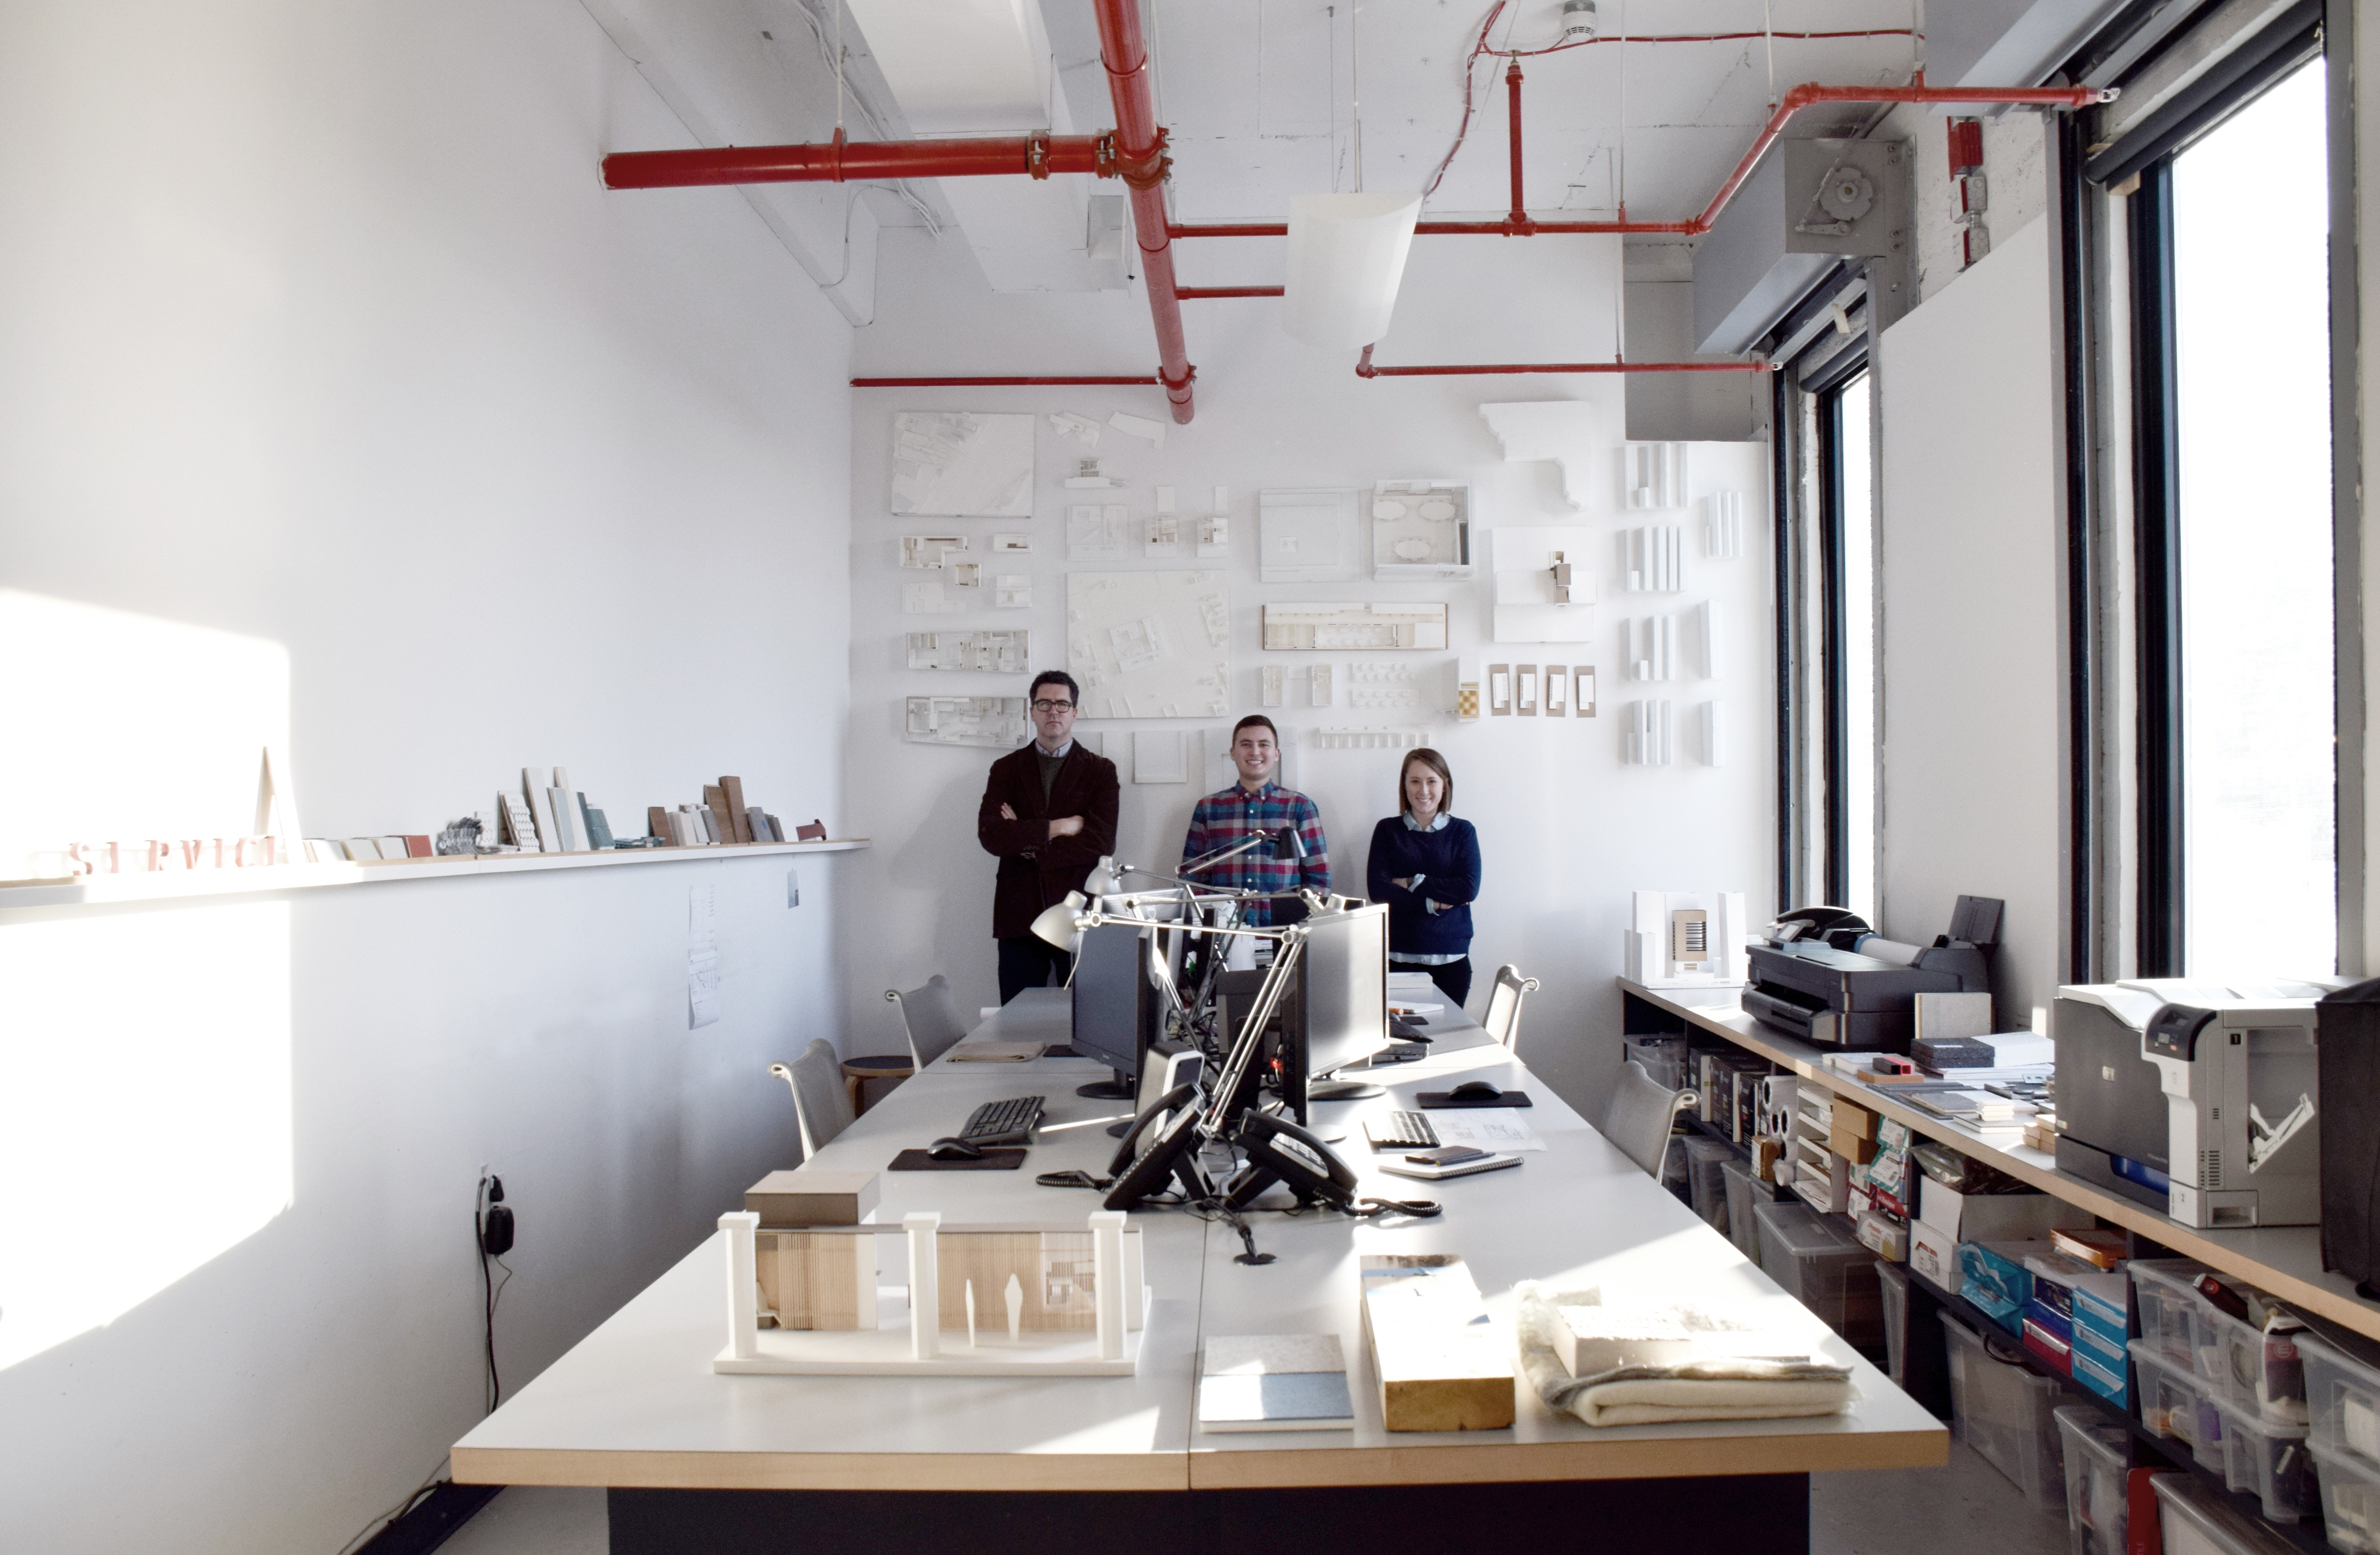 Captivating The Studio Modh Team. Image Via Studio Modh